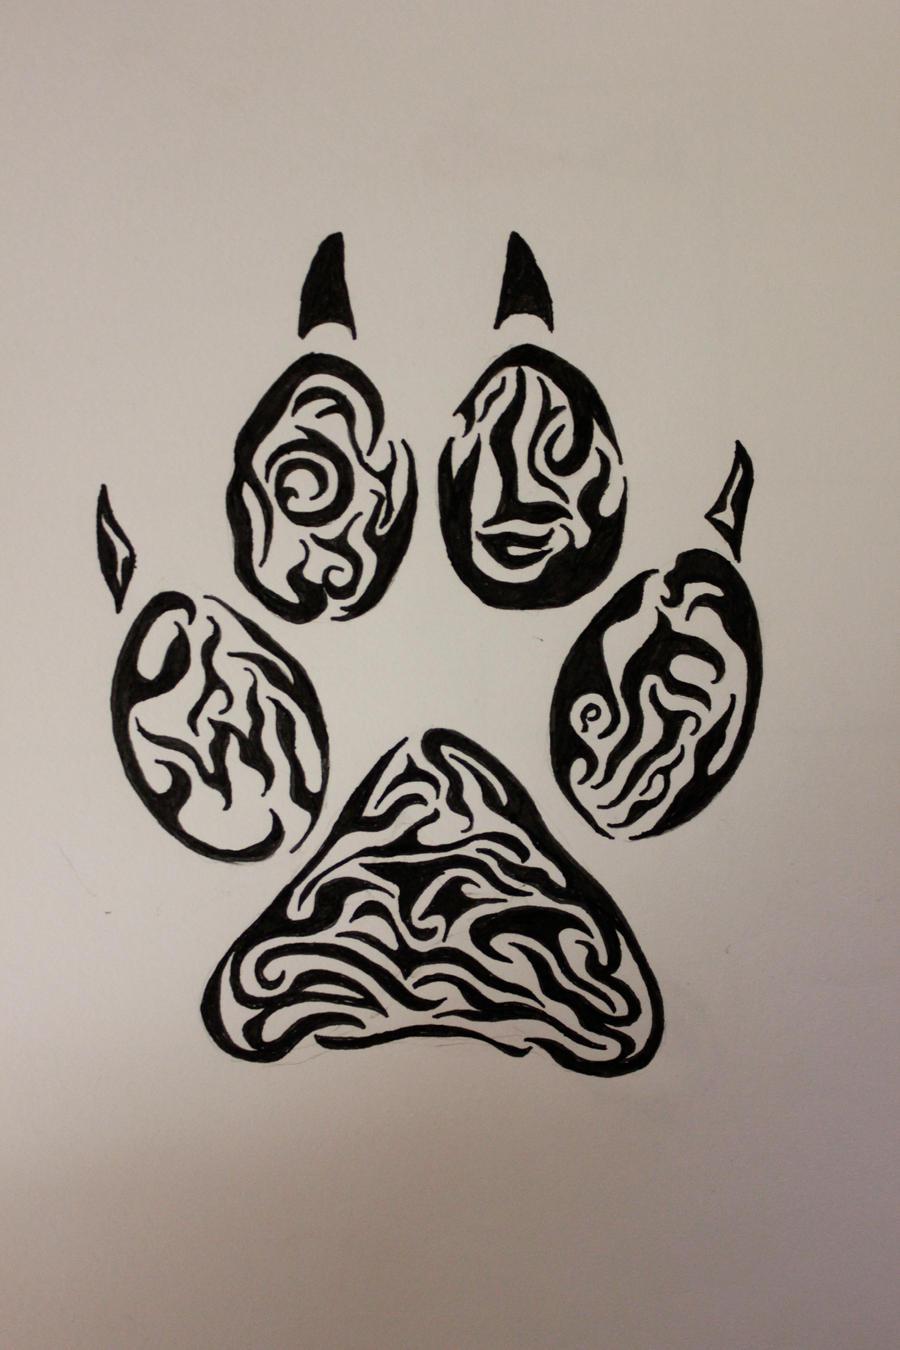 tattoo hd tribal Tattoo WolfBaltoDog on by Wolf Tribal DeviantArt Paw